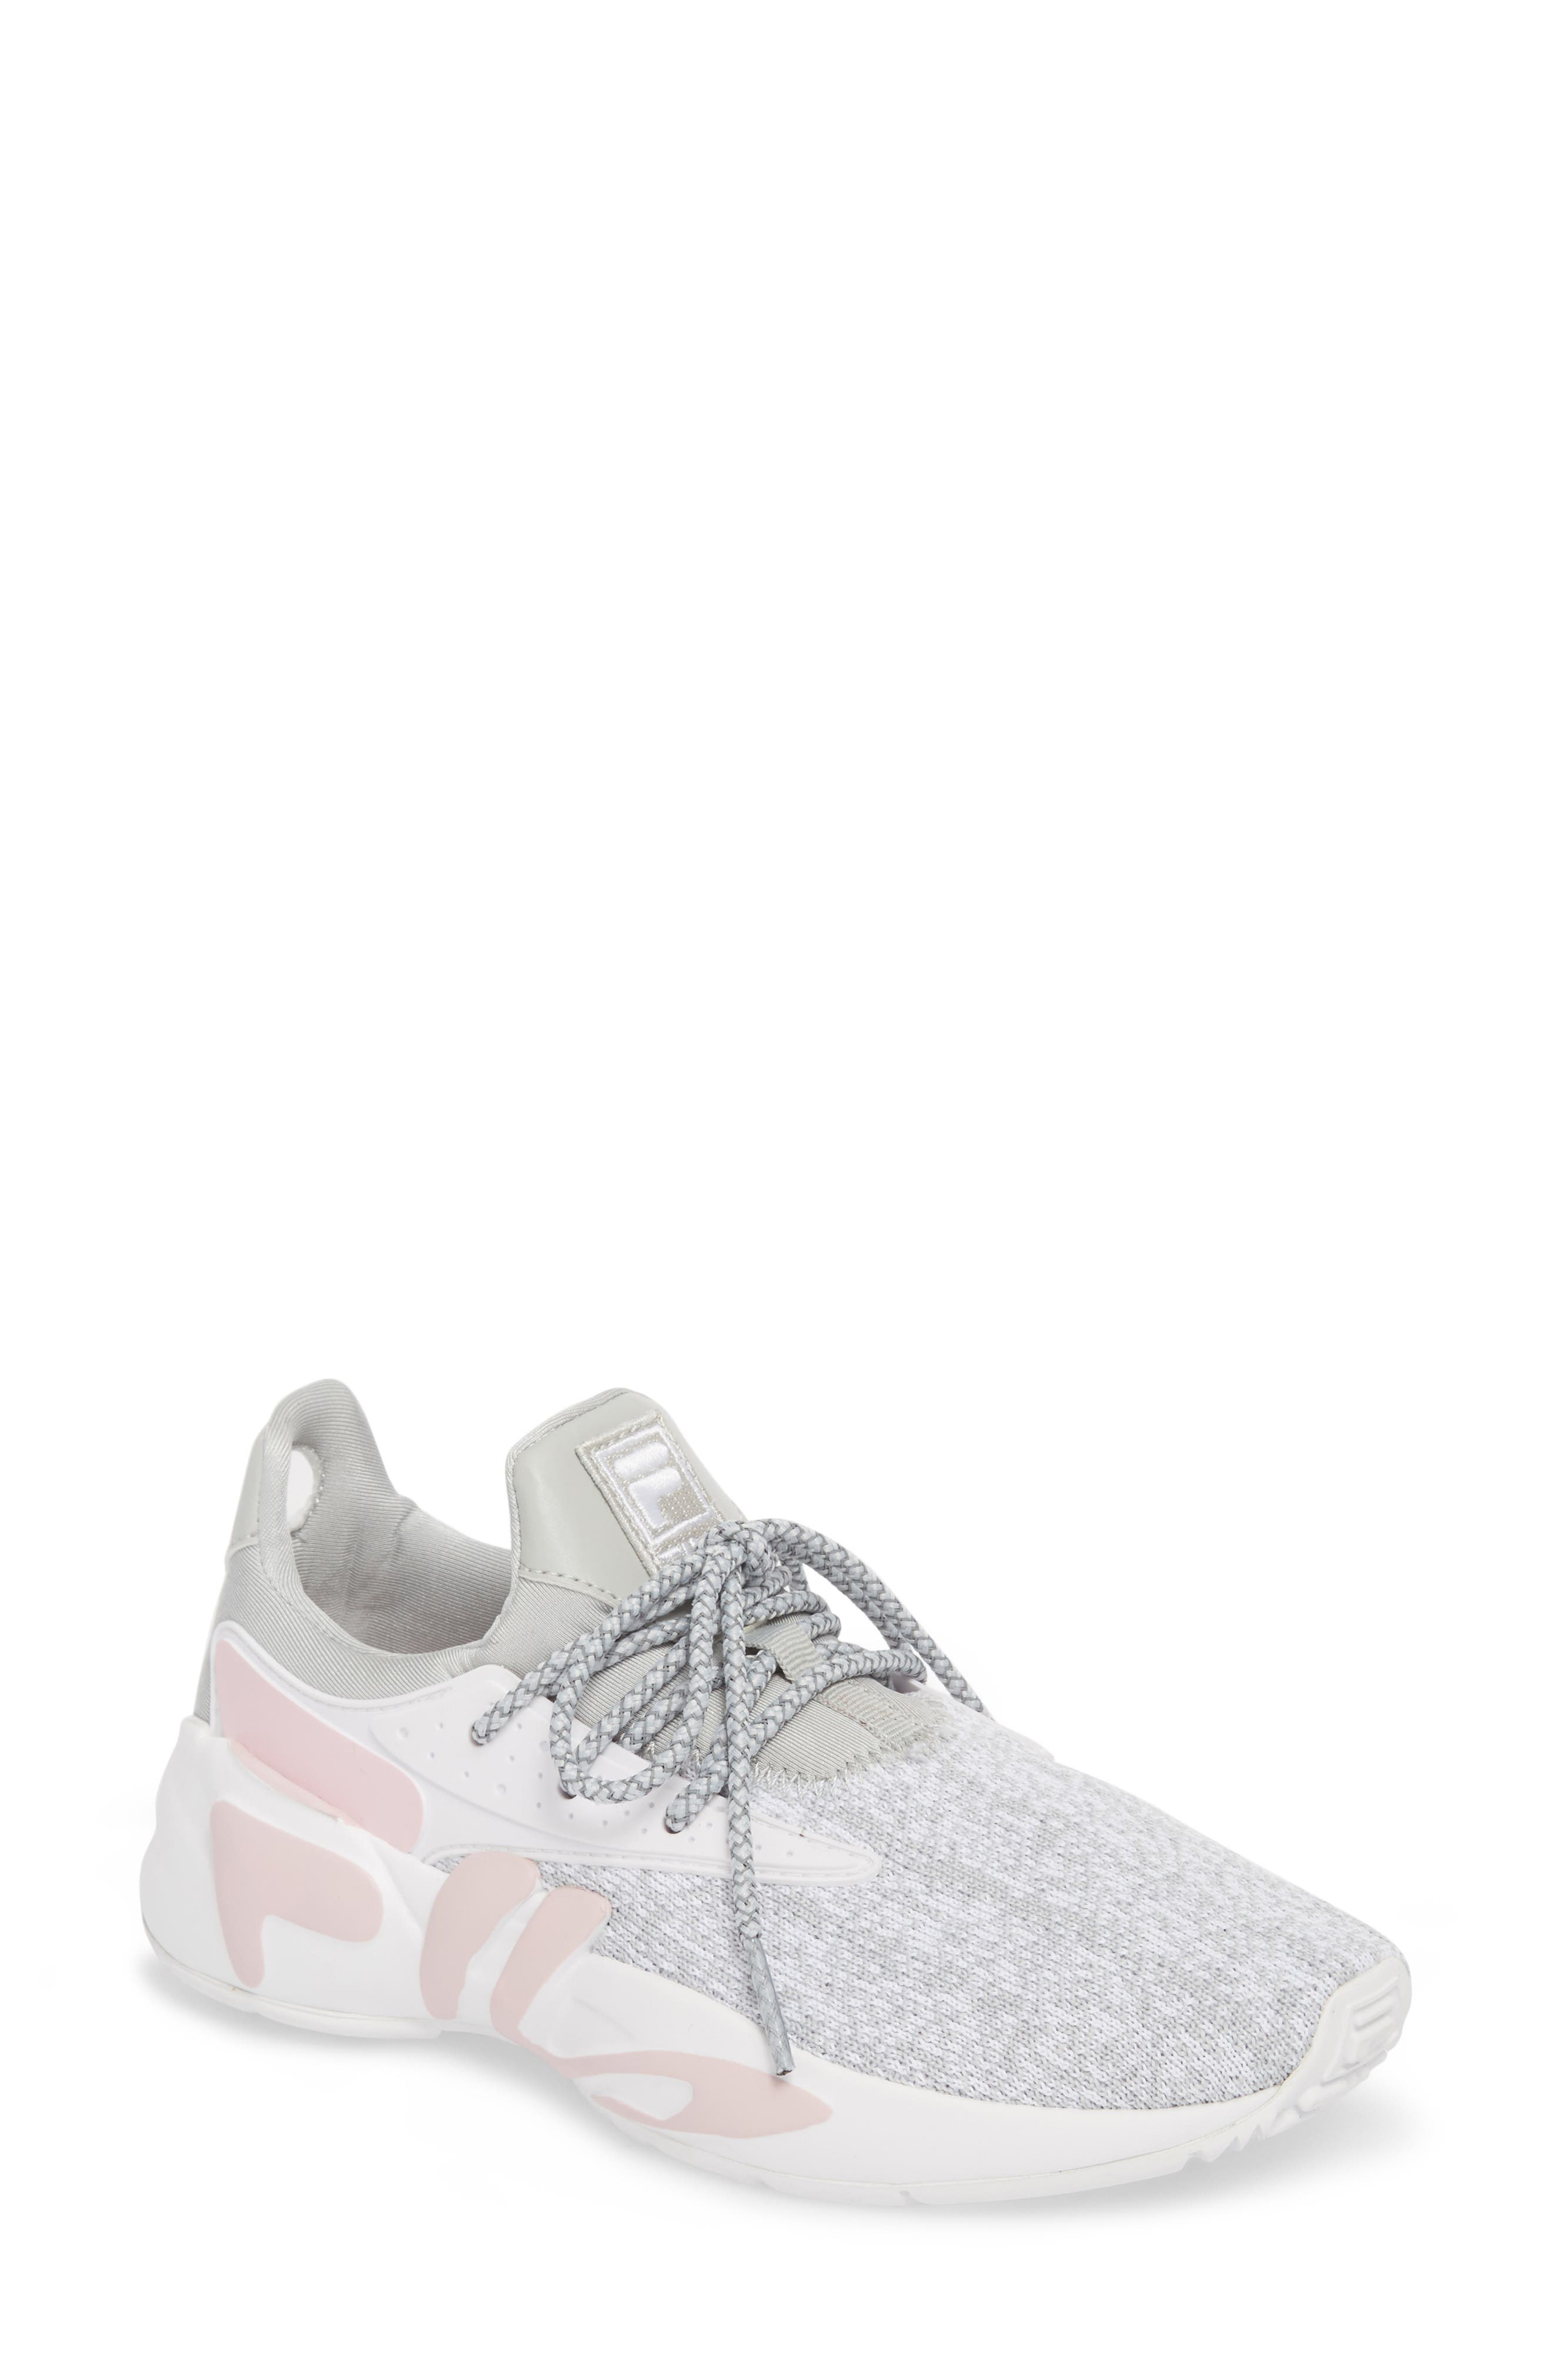 Mindbreaker 2.0 Sneaker,                             Main thumbnail 1, color,                             HIGHRISE/ WHITE/ CHALK PINK